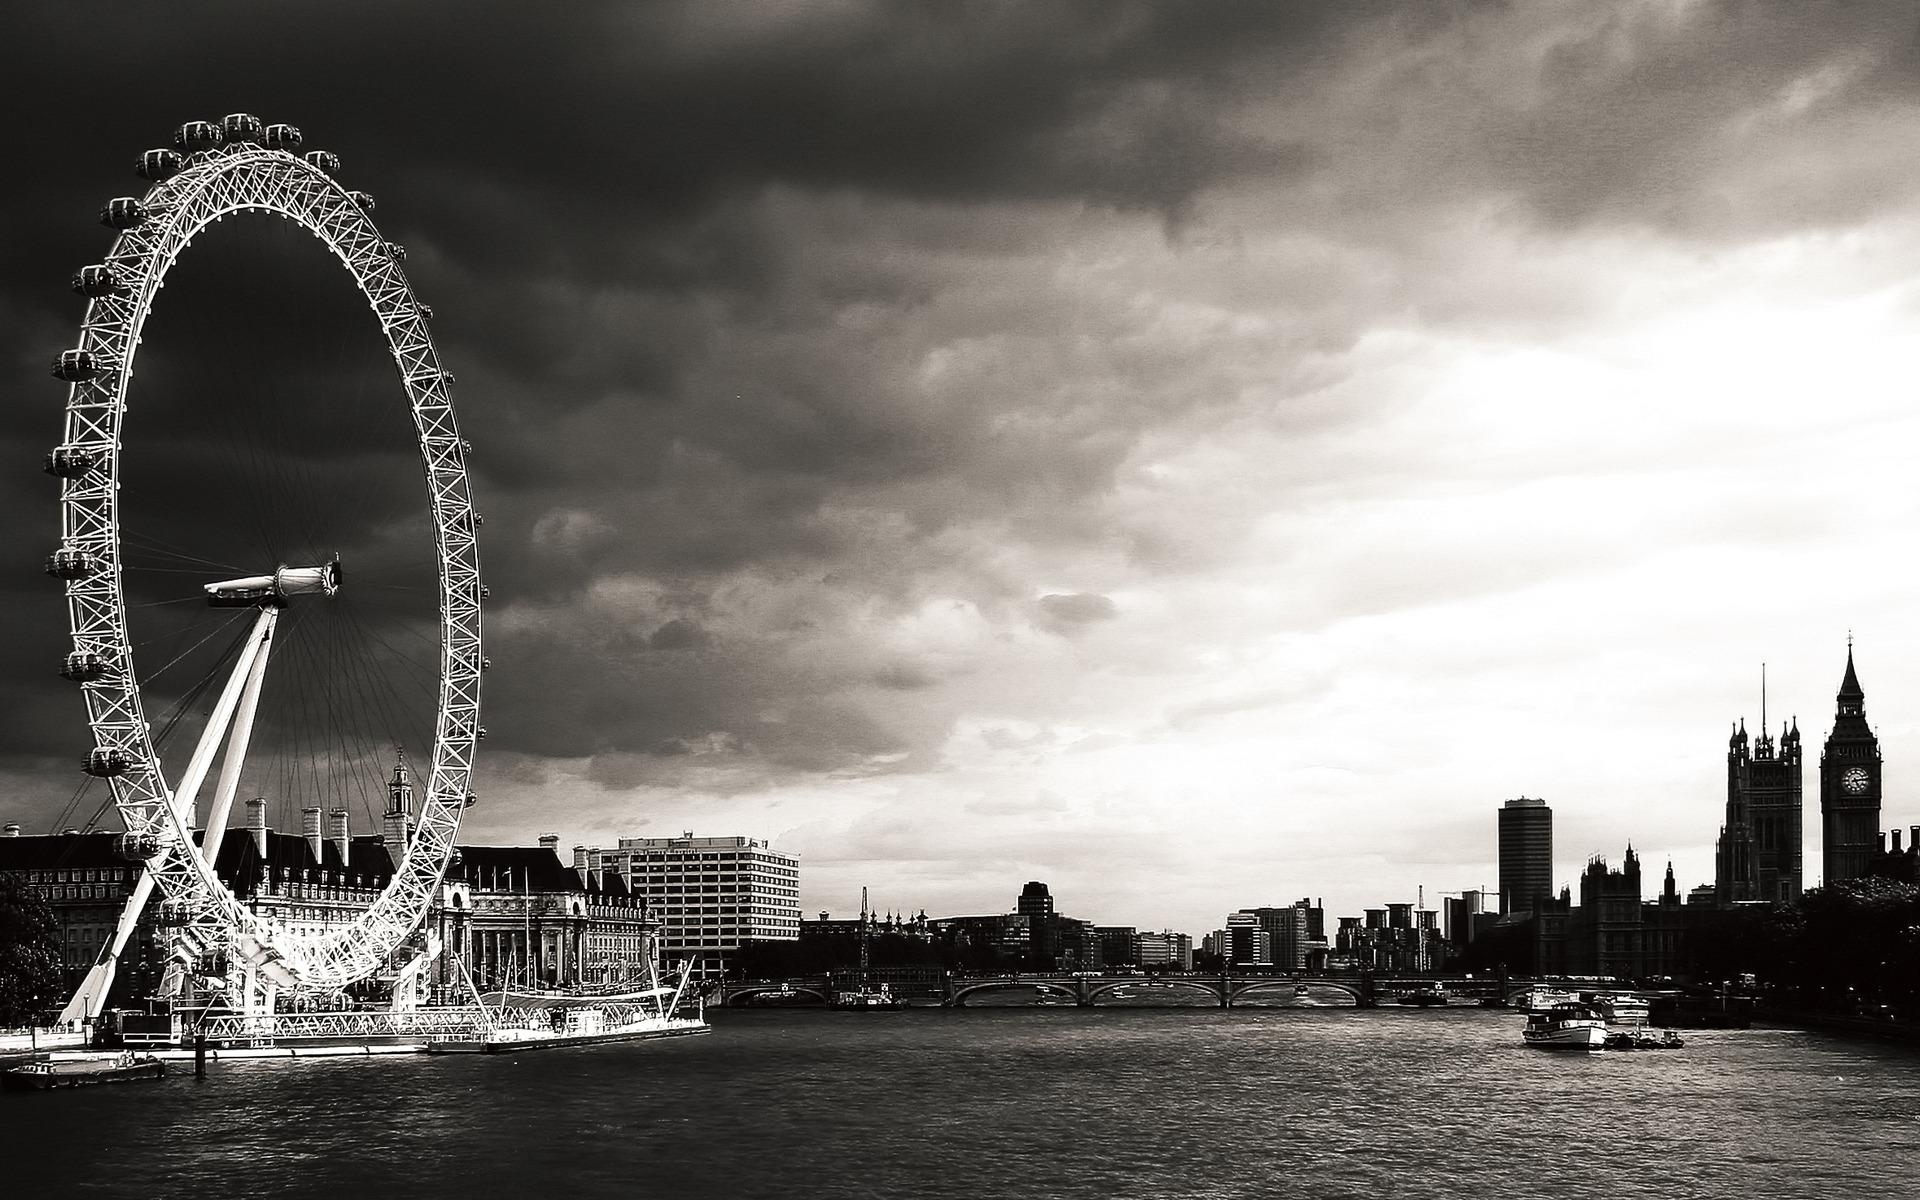 london hd images - photo #38